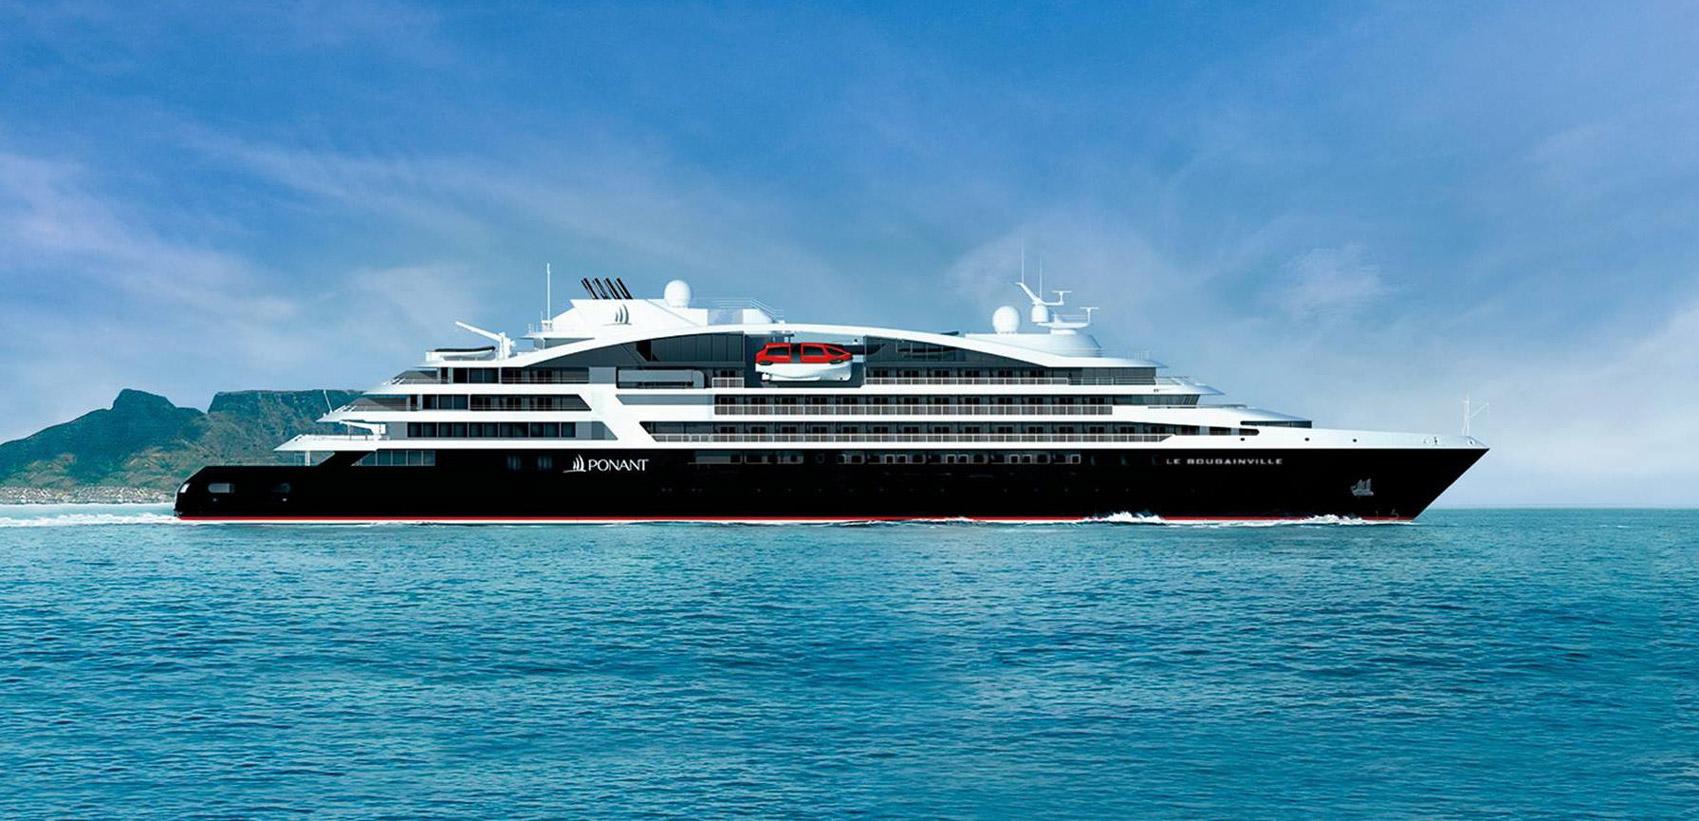 Le Bougainville's Maiden Voyage Through the Mediterranean Islands 1